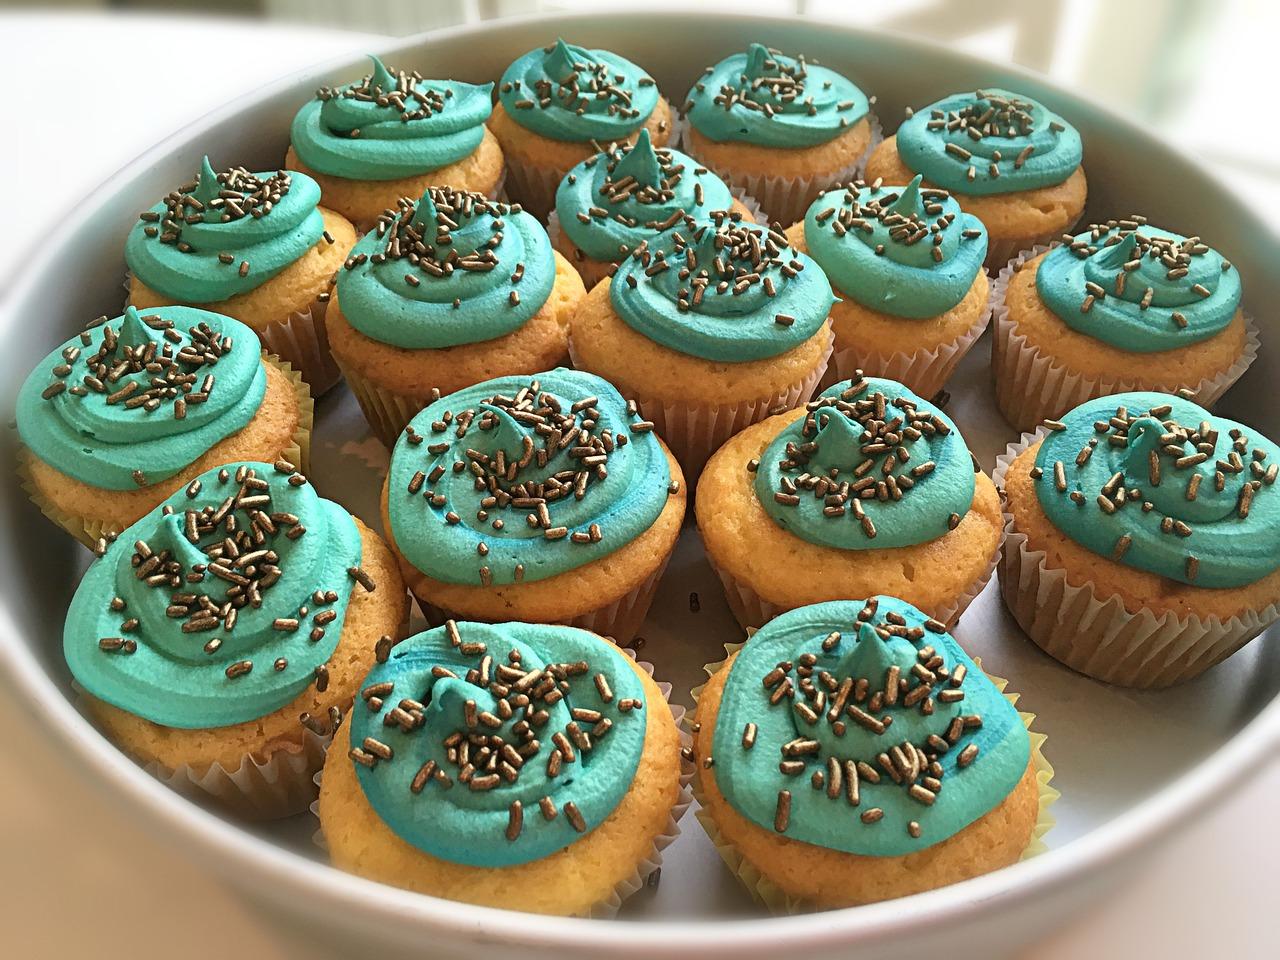 cupcakes-3449167_1280.jpg